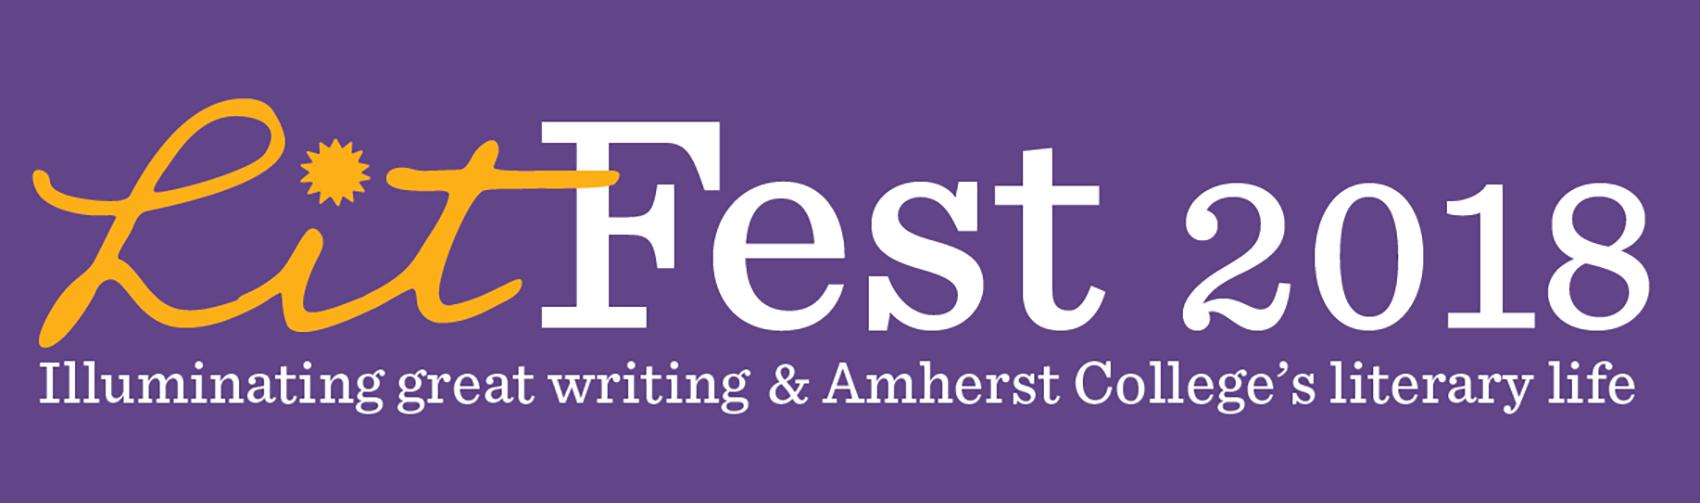 Pulitzer Prize-Winner Junot Díaz Headlines Amherst College LitFest 2018